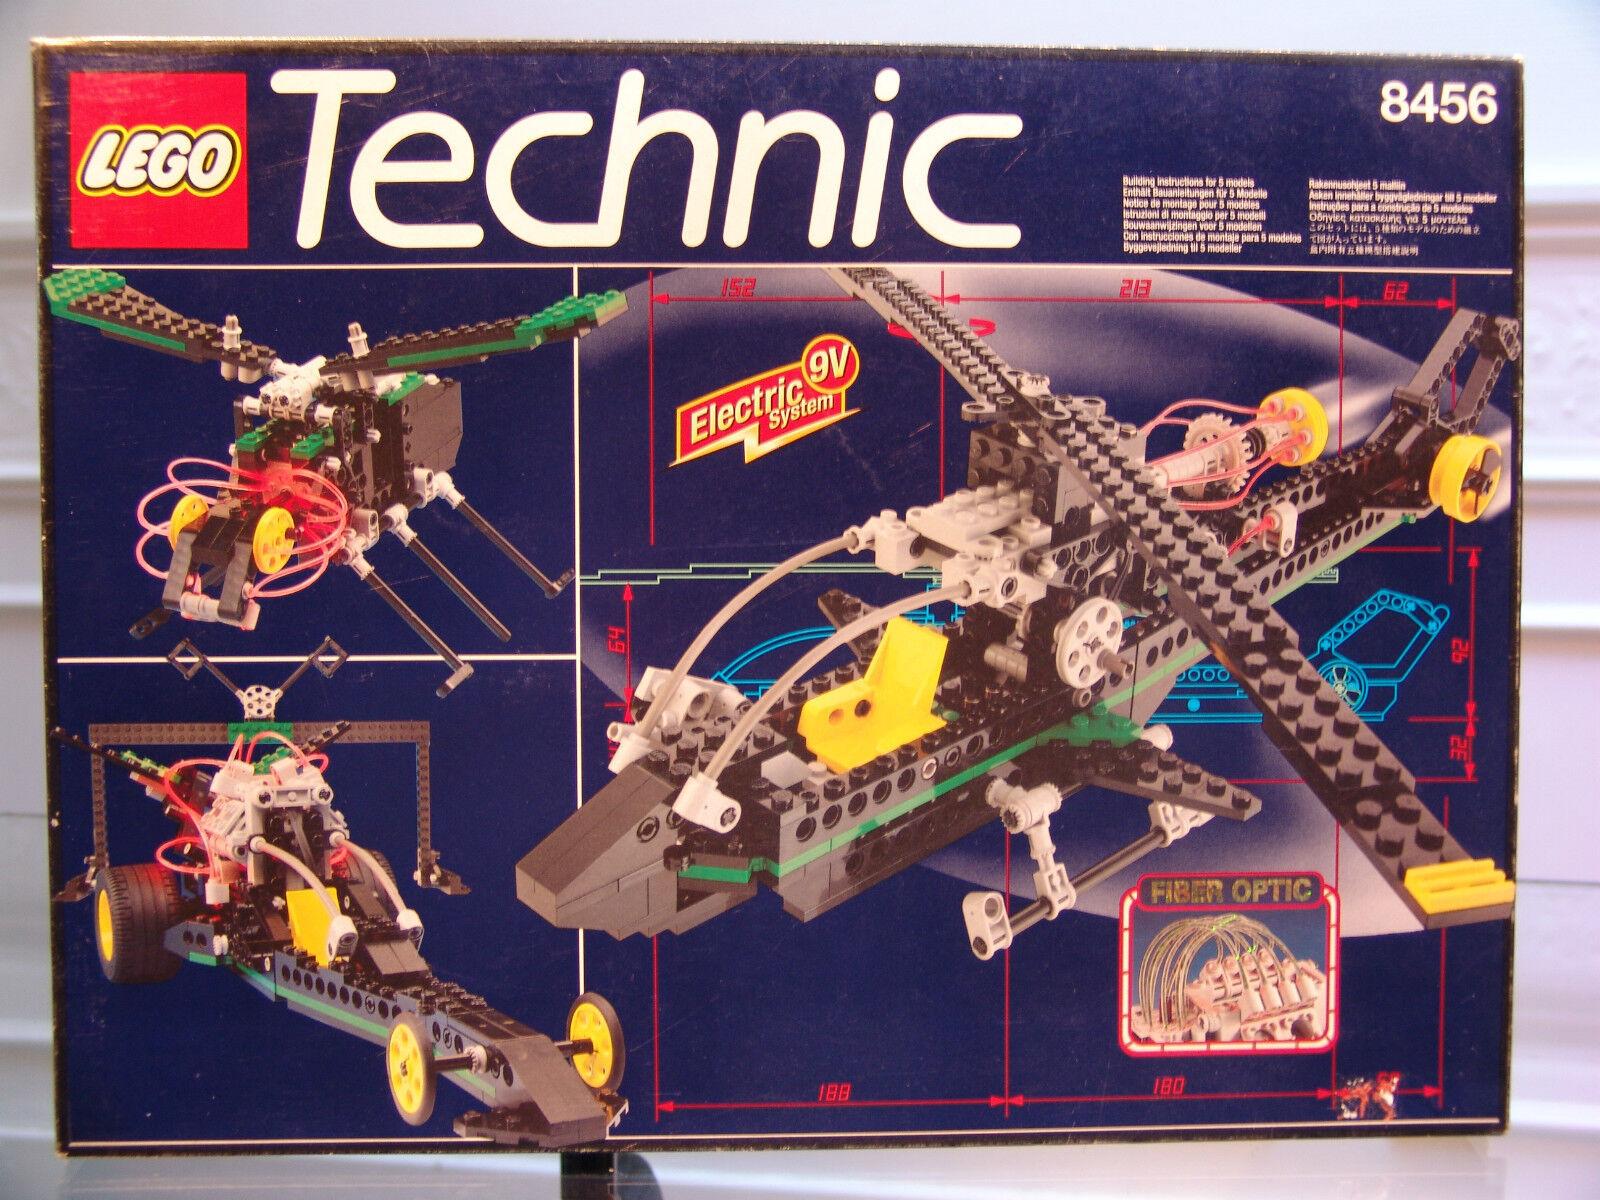 1996 Lego Technic 8456 Fibra Óptica Multi Conjunto Menta en Caja Sellada Nuevo